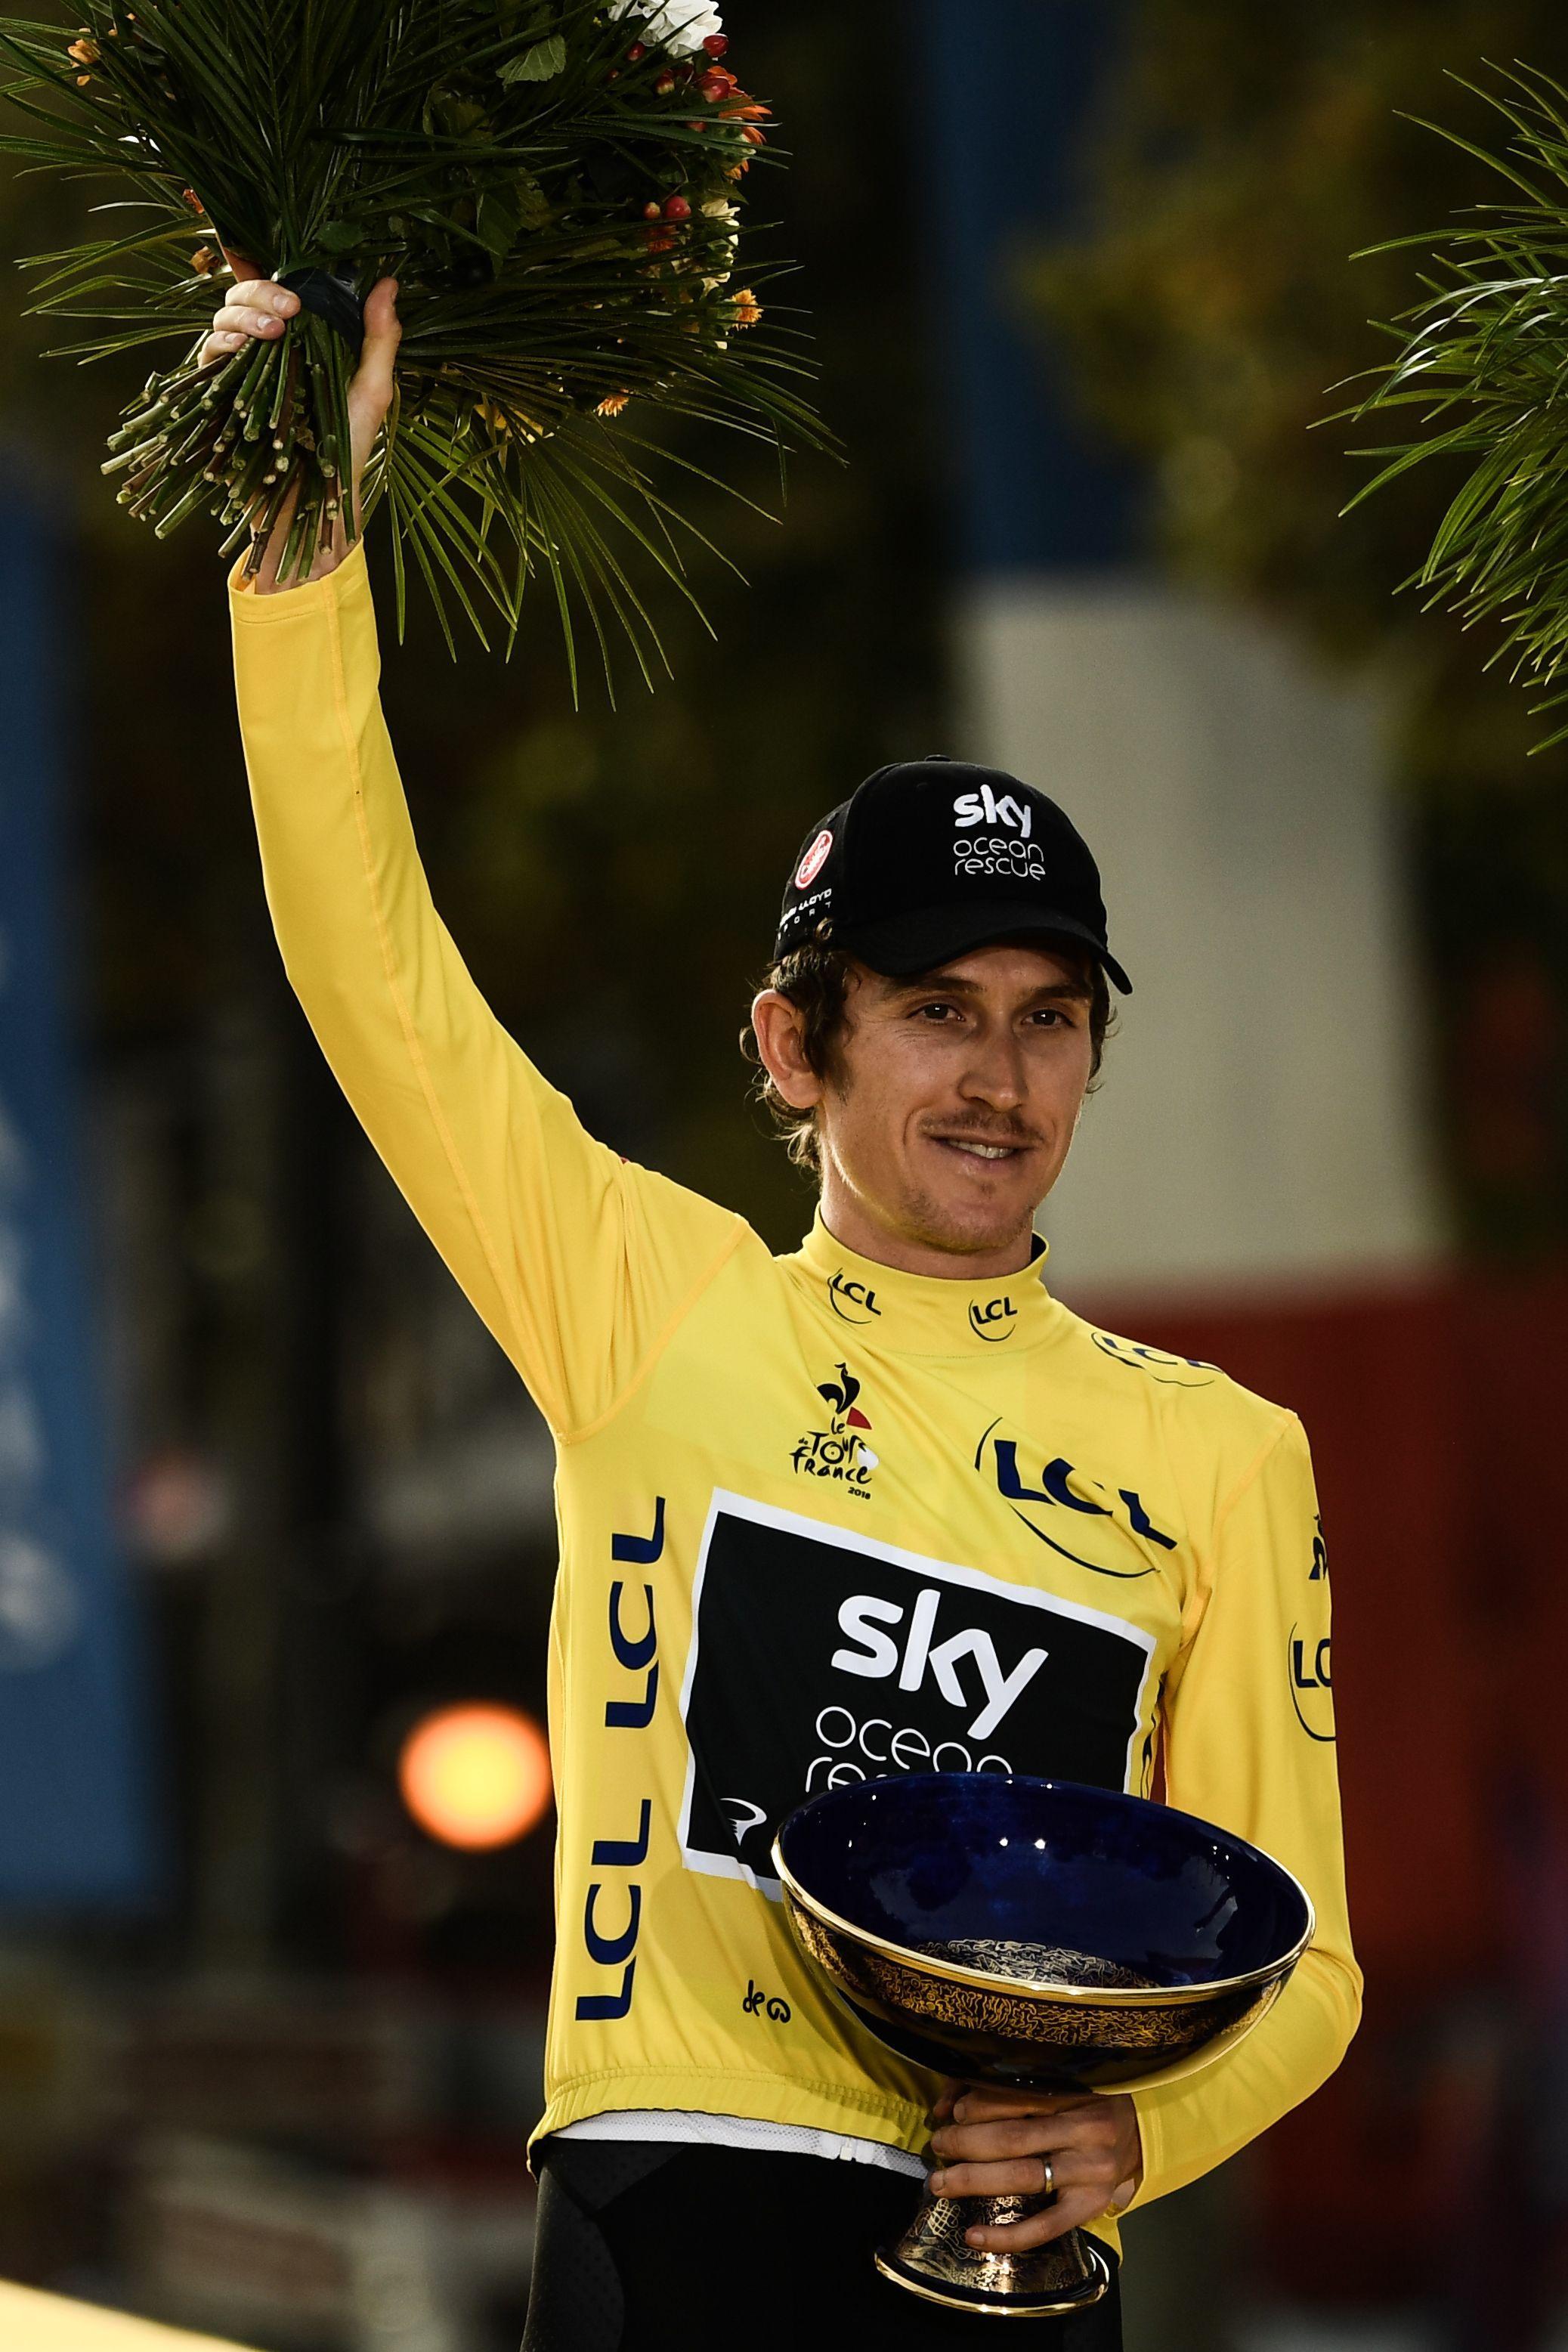 Thomas is back on the saddle following his Tour de France triumph